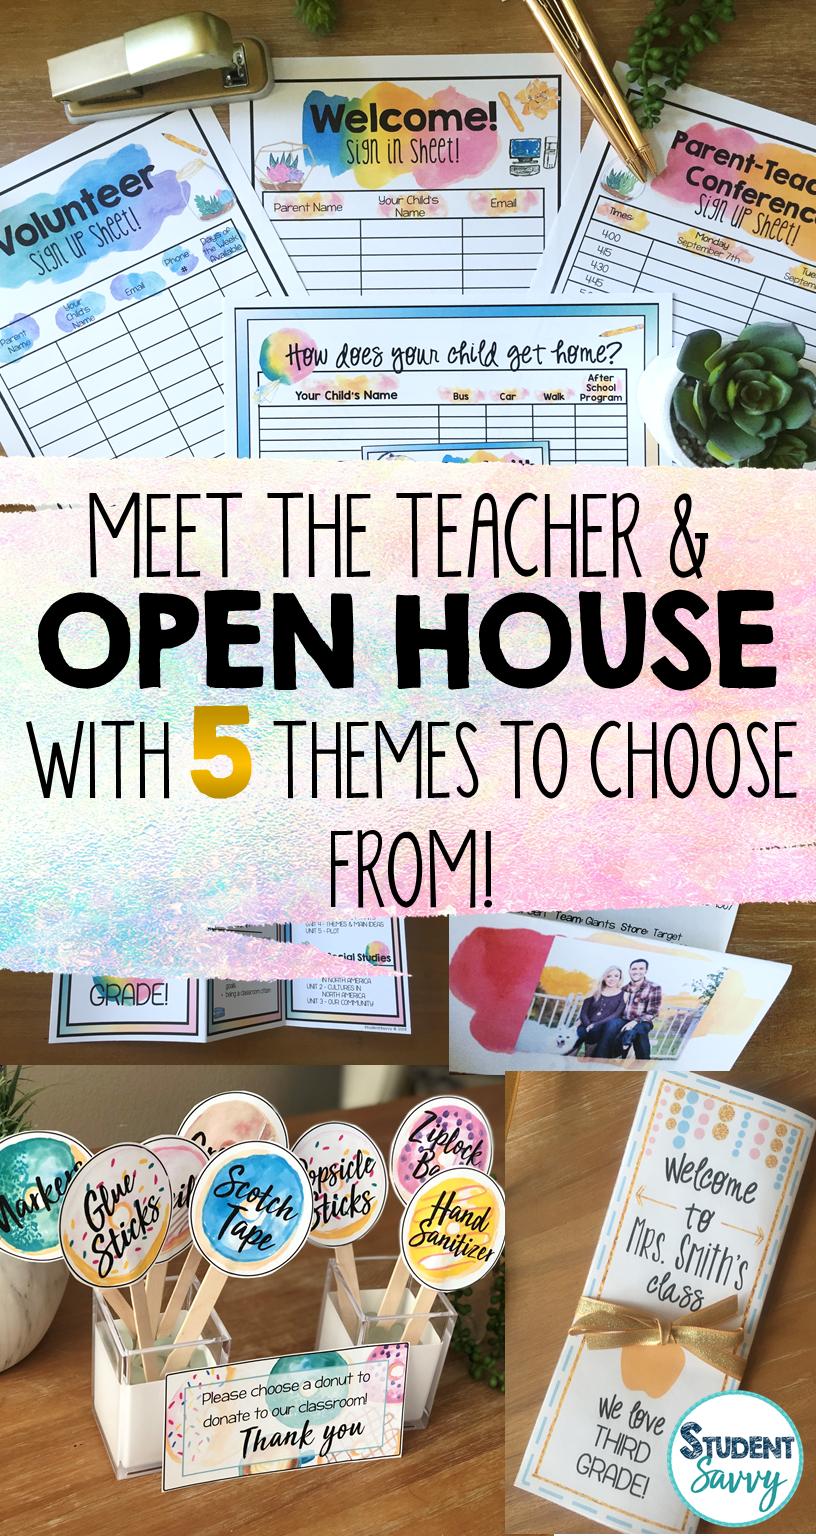 Ideas for Open House and Meet the Teacher Night! #meettheteachernight